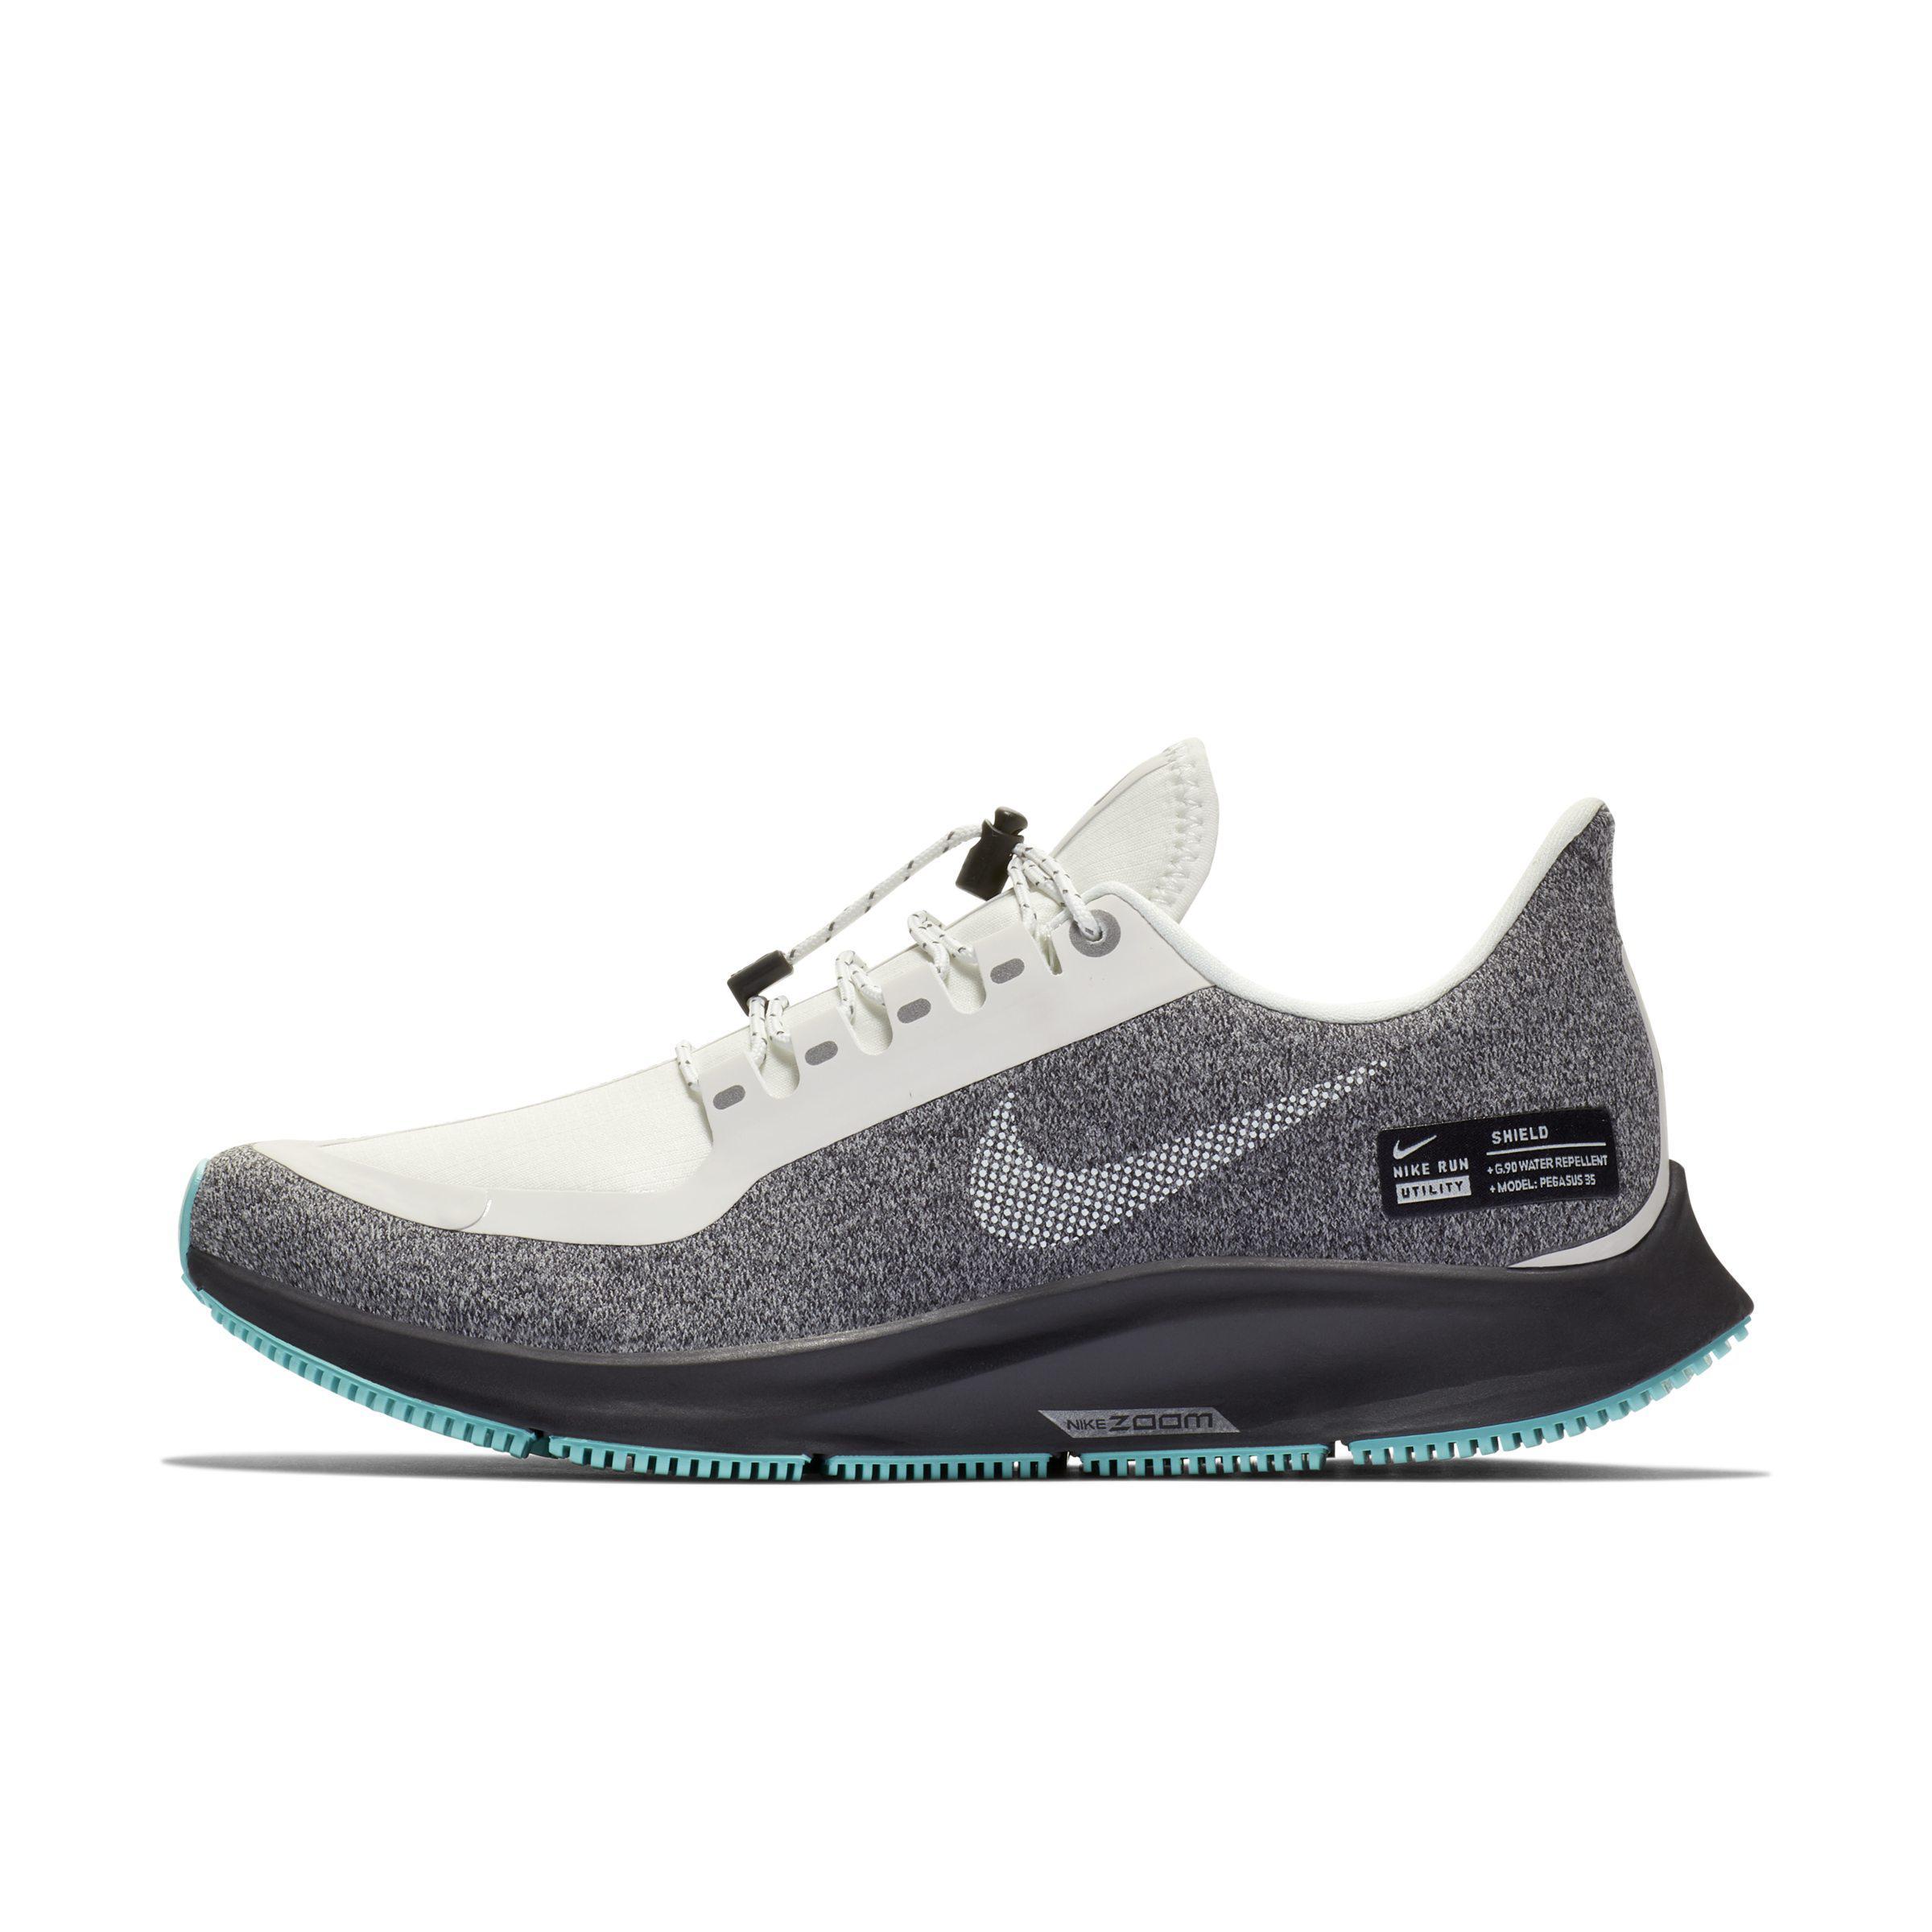 a03b0d816db Nike Air Zoom Pegasus 35 Shield Water-repellent Running Shoe in ...